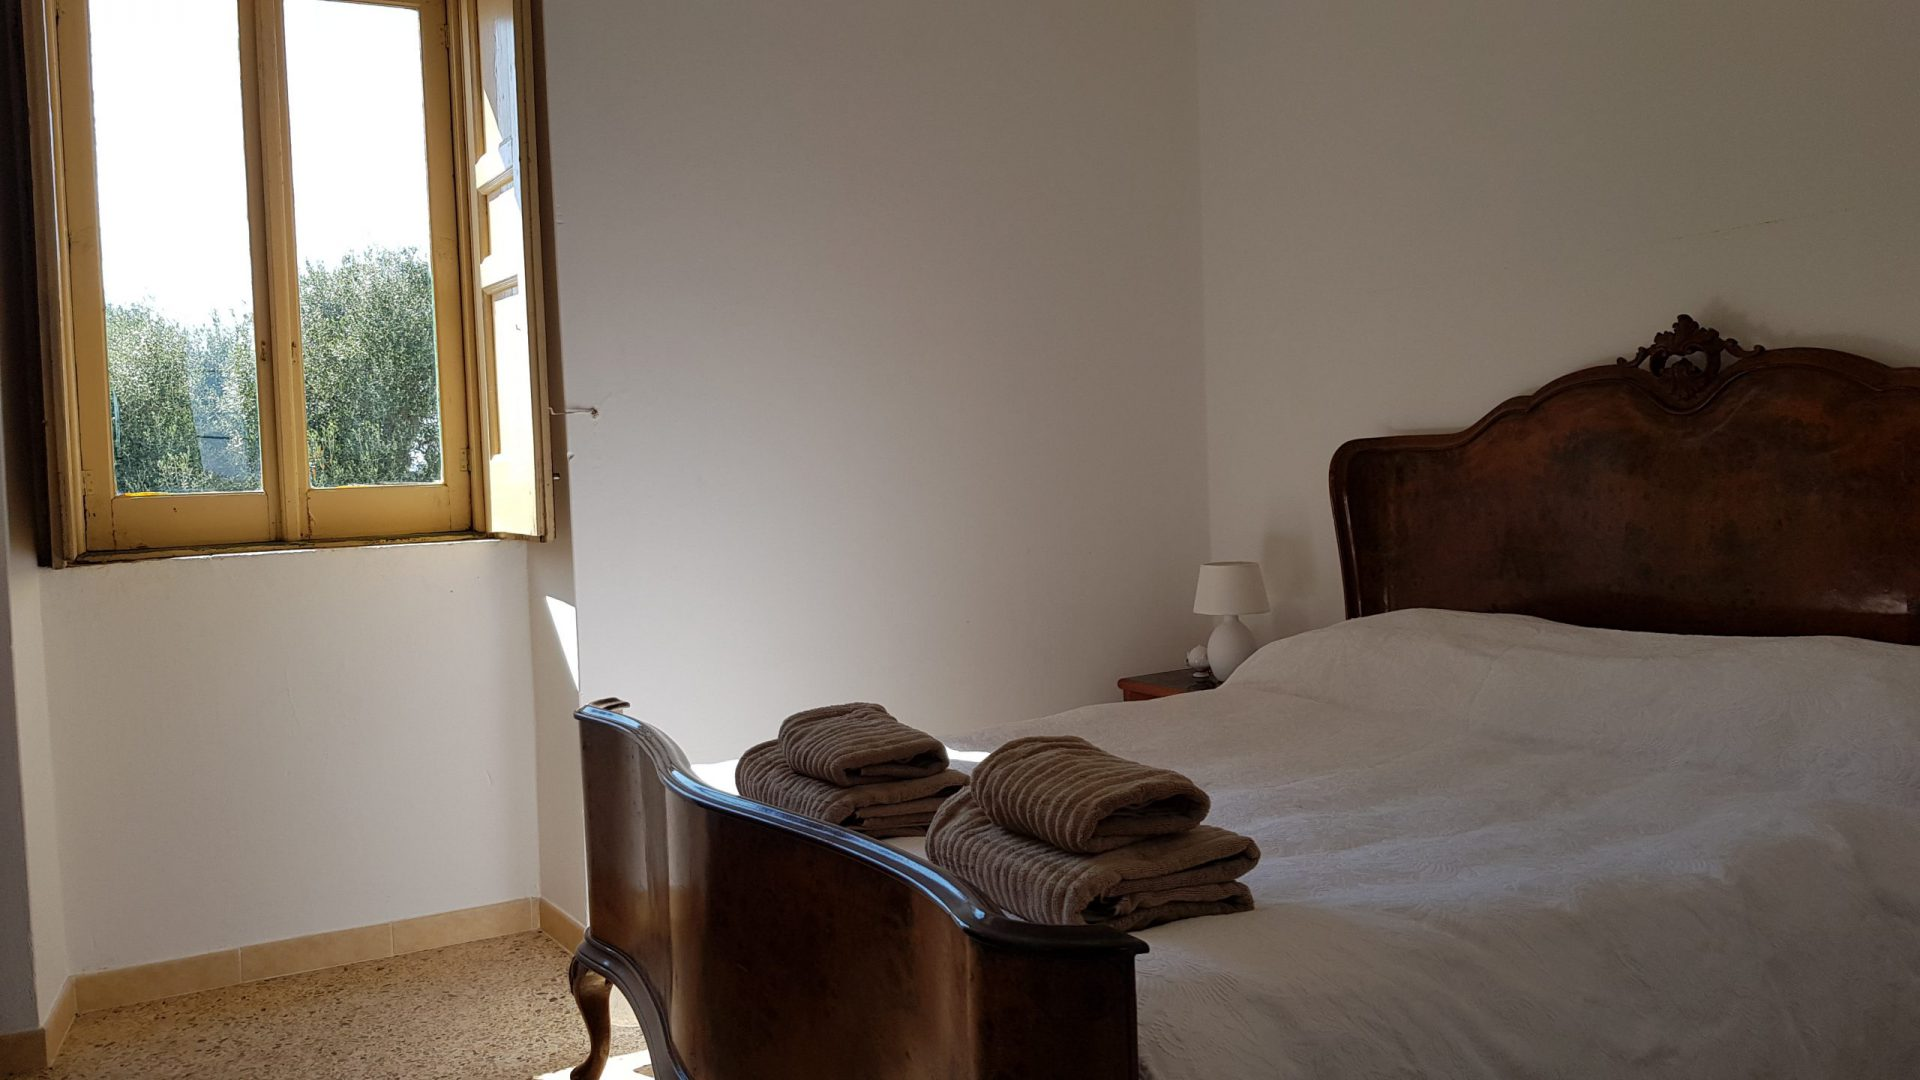 Second queen size bedroom in Masseria Bellavista Ostuni Vacation holiday rental villa in Puglia with pool and seaview